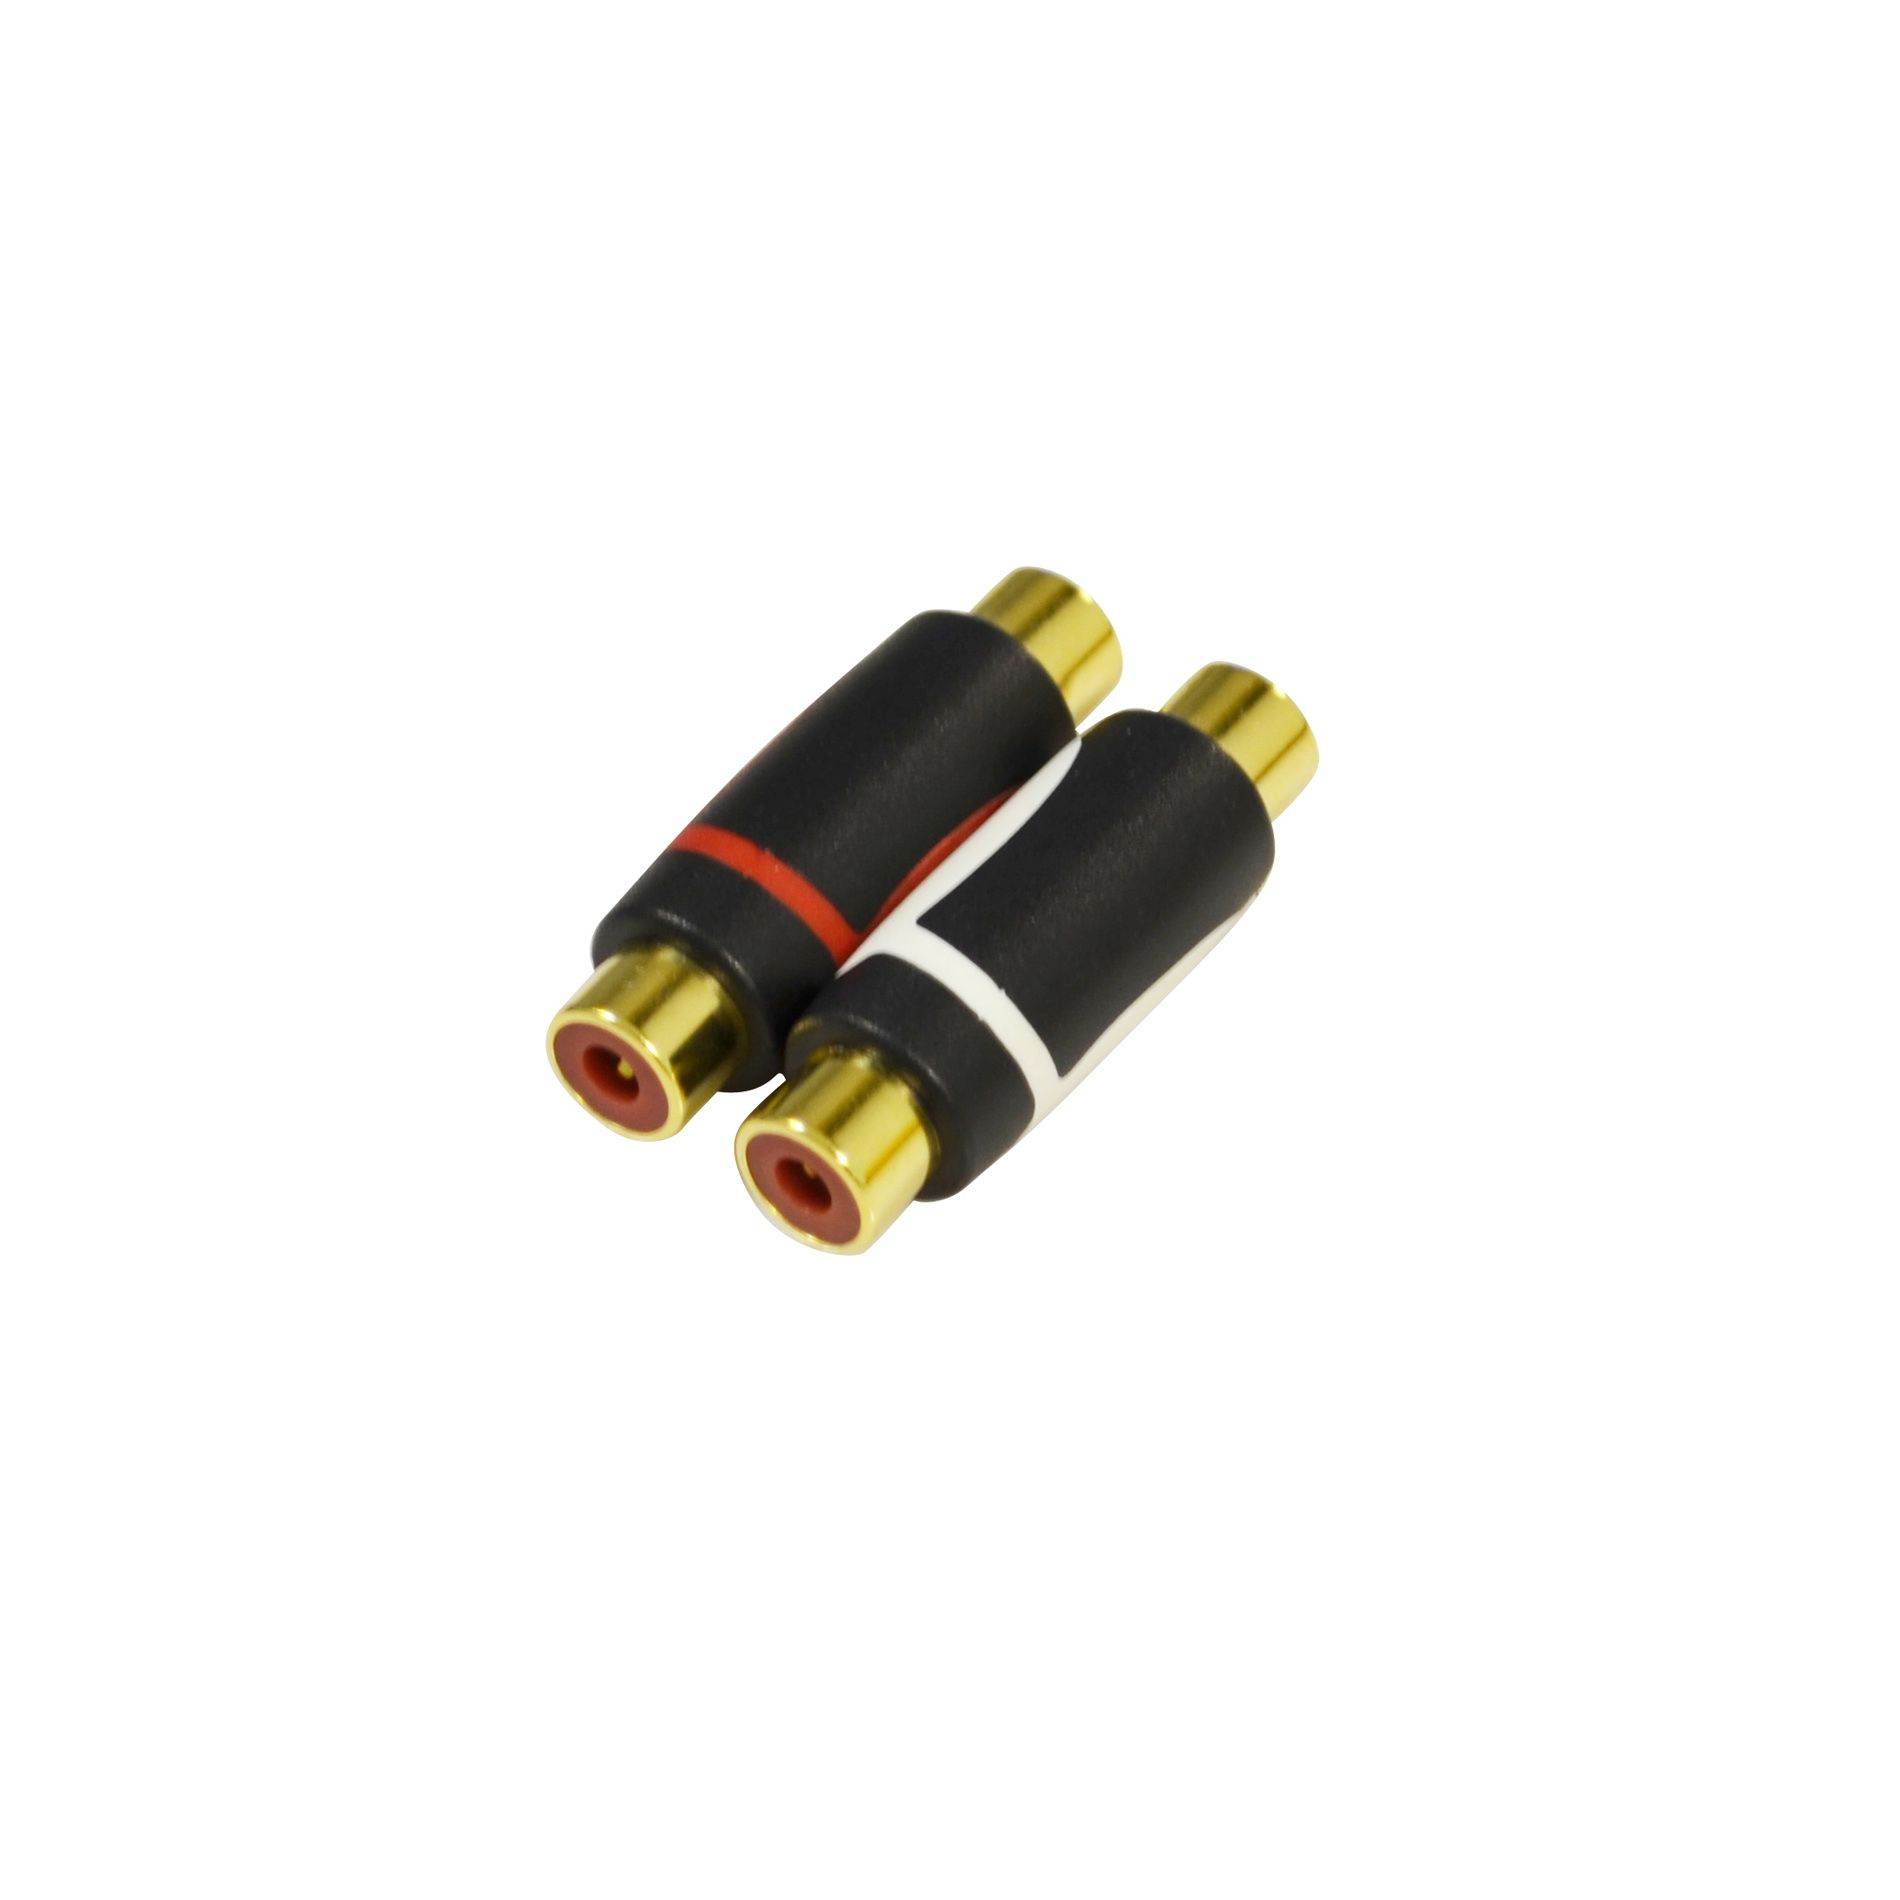 Alphaline™ 2-Pack RCA Plug Couplers